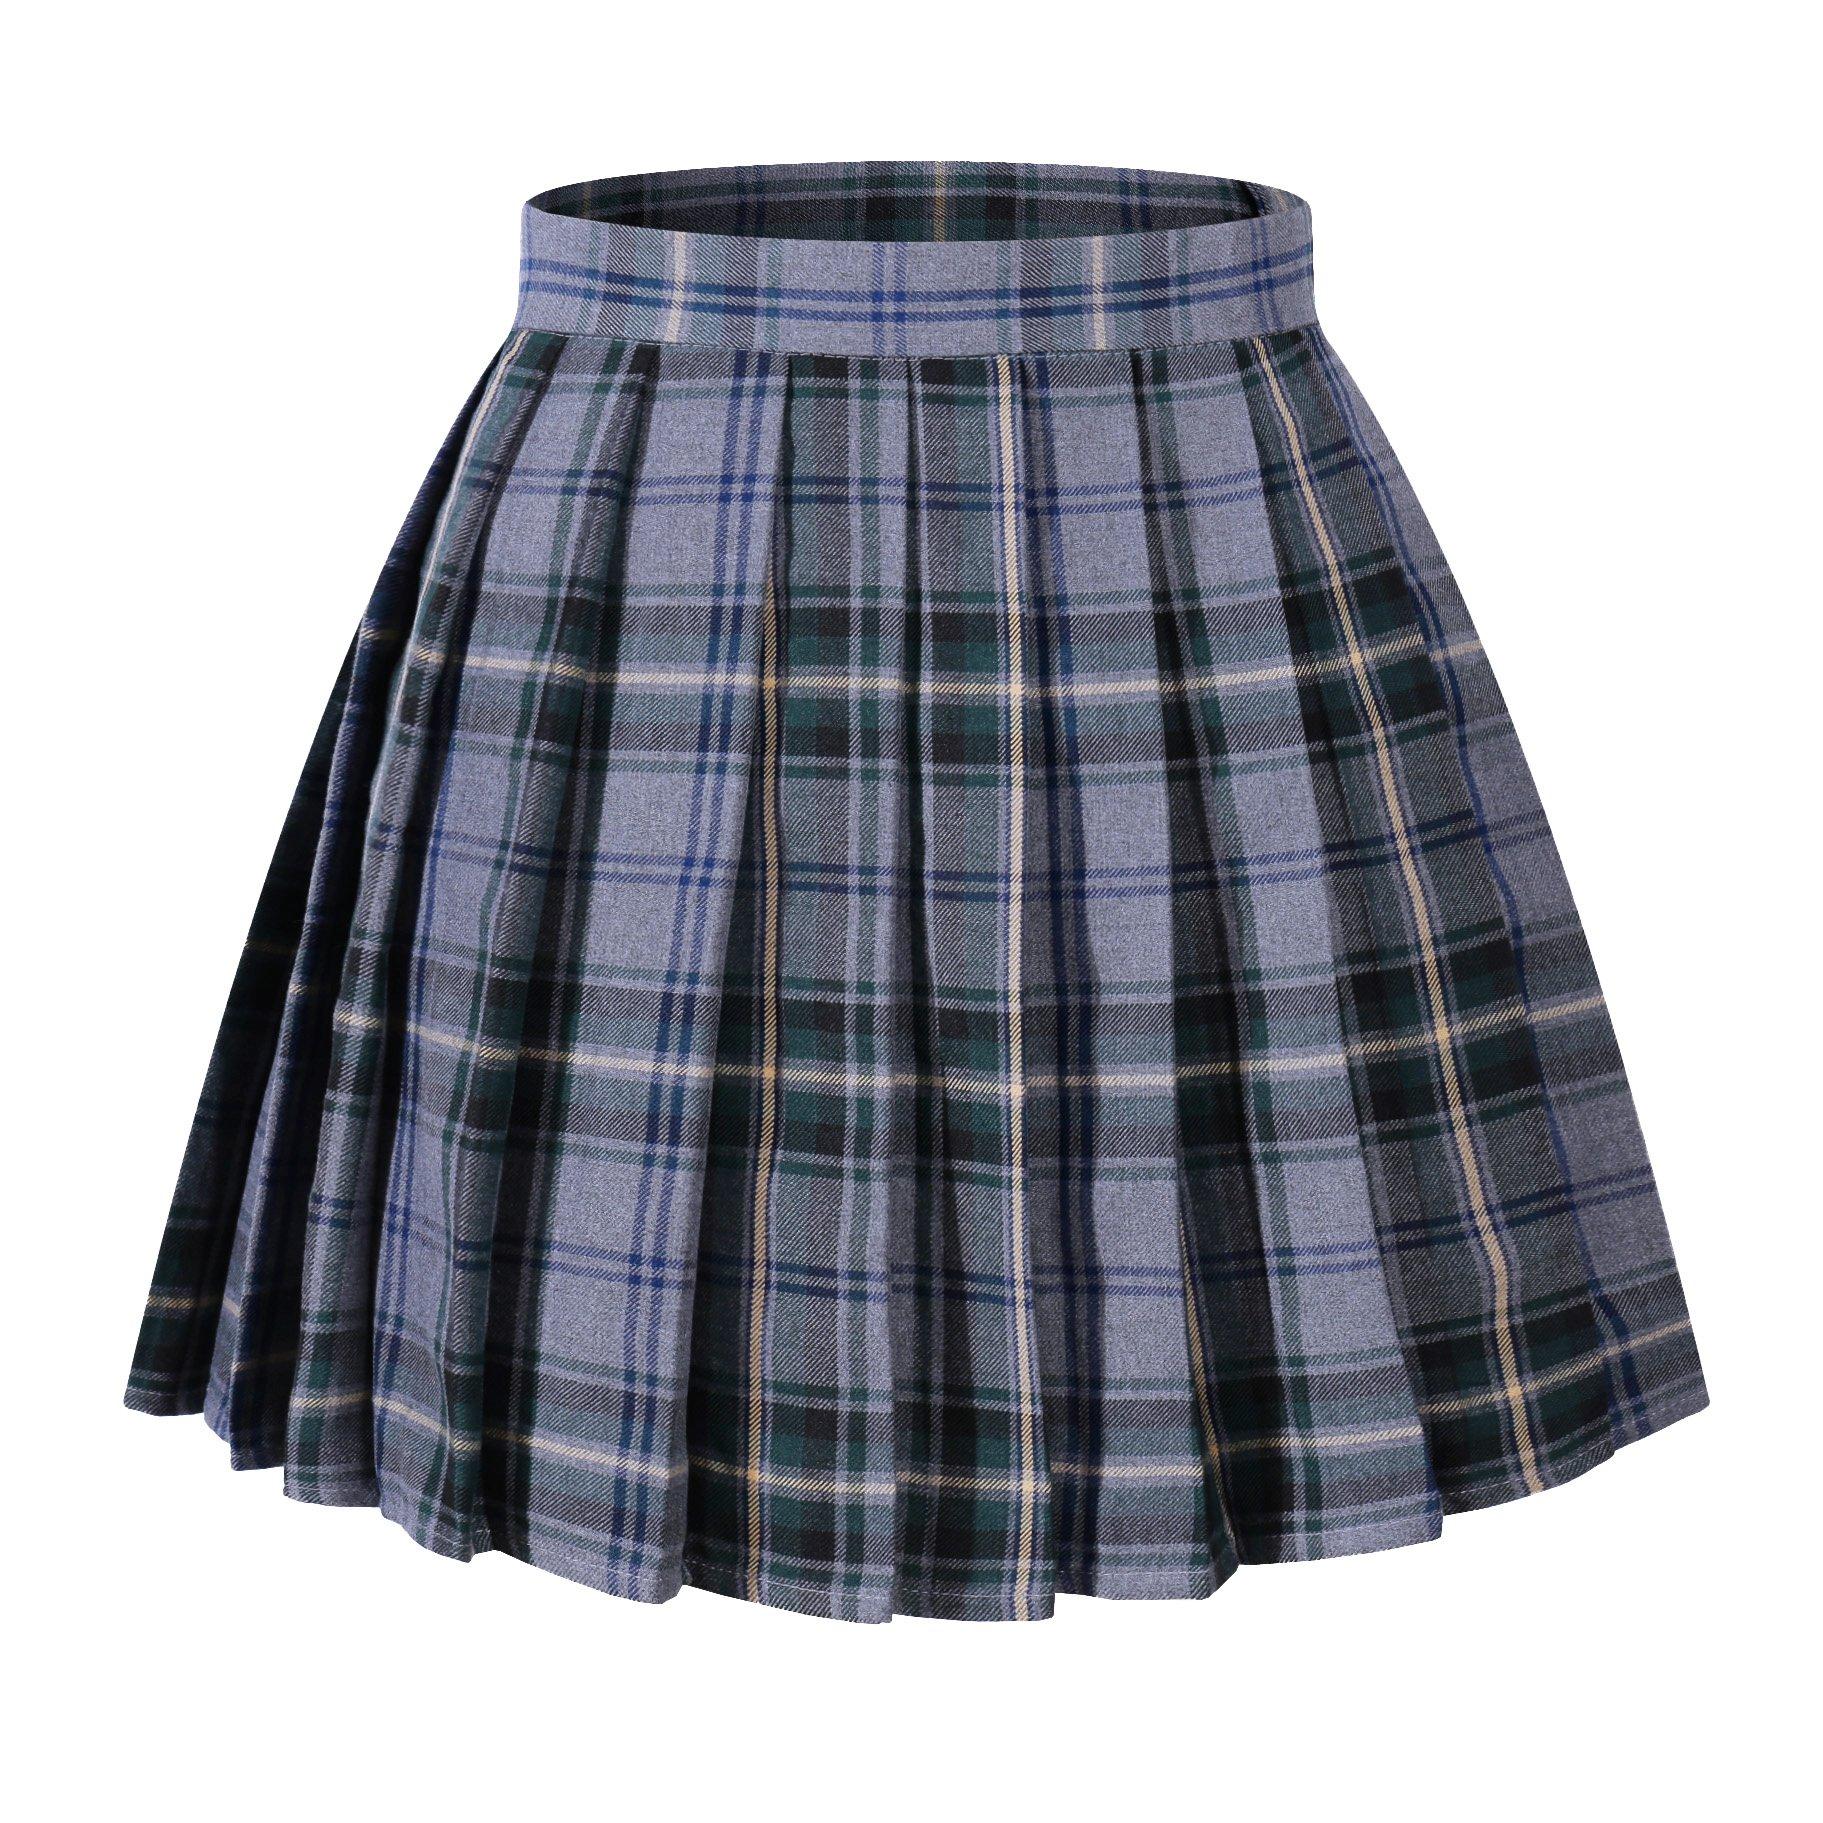 Beautifulfashionlife Girl's A-line Kilt Plaid Pleated Skirts (XS,Light Blue Mixed Green)